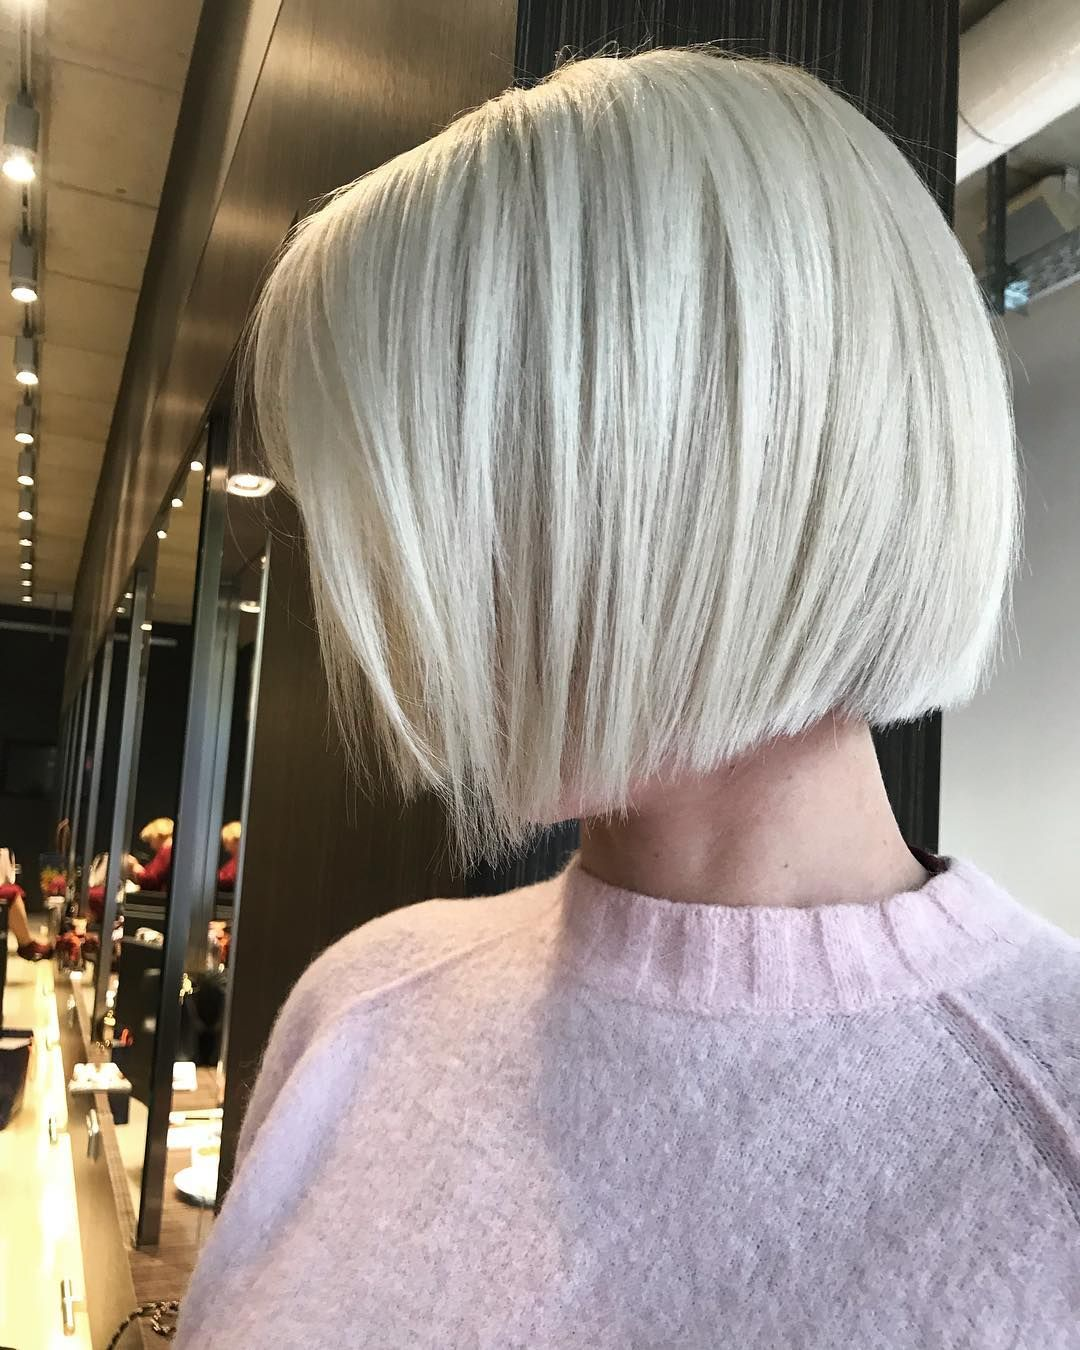 "Haarwerk München on Instagram: ""Blonde-bob #lonhair #experts #haarwerk #münchen #berlin #kudamm #paintimg #perfektion #colorist #ayseauth #loreal #love #haircut #best…"""